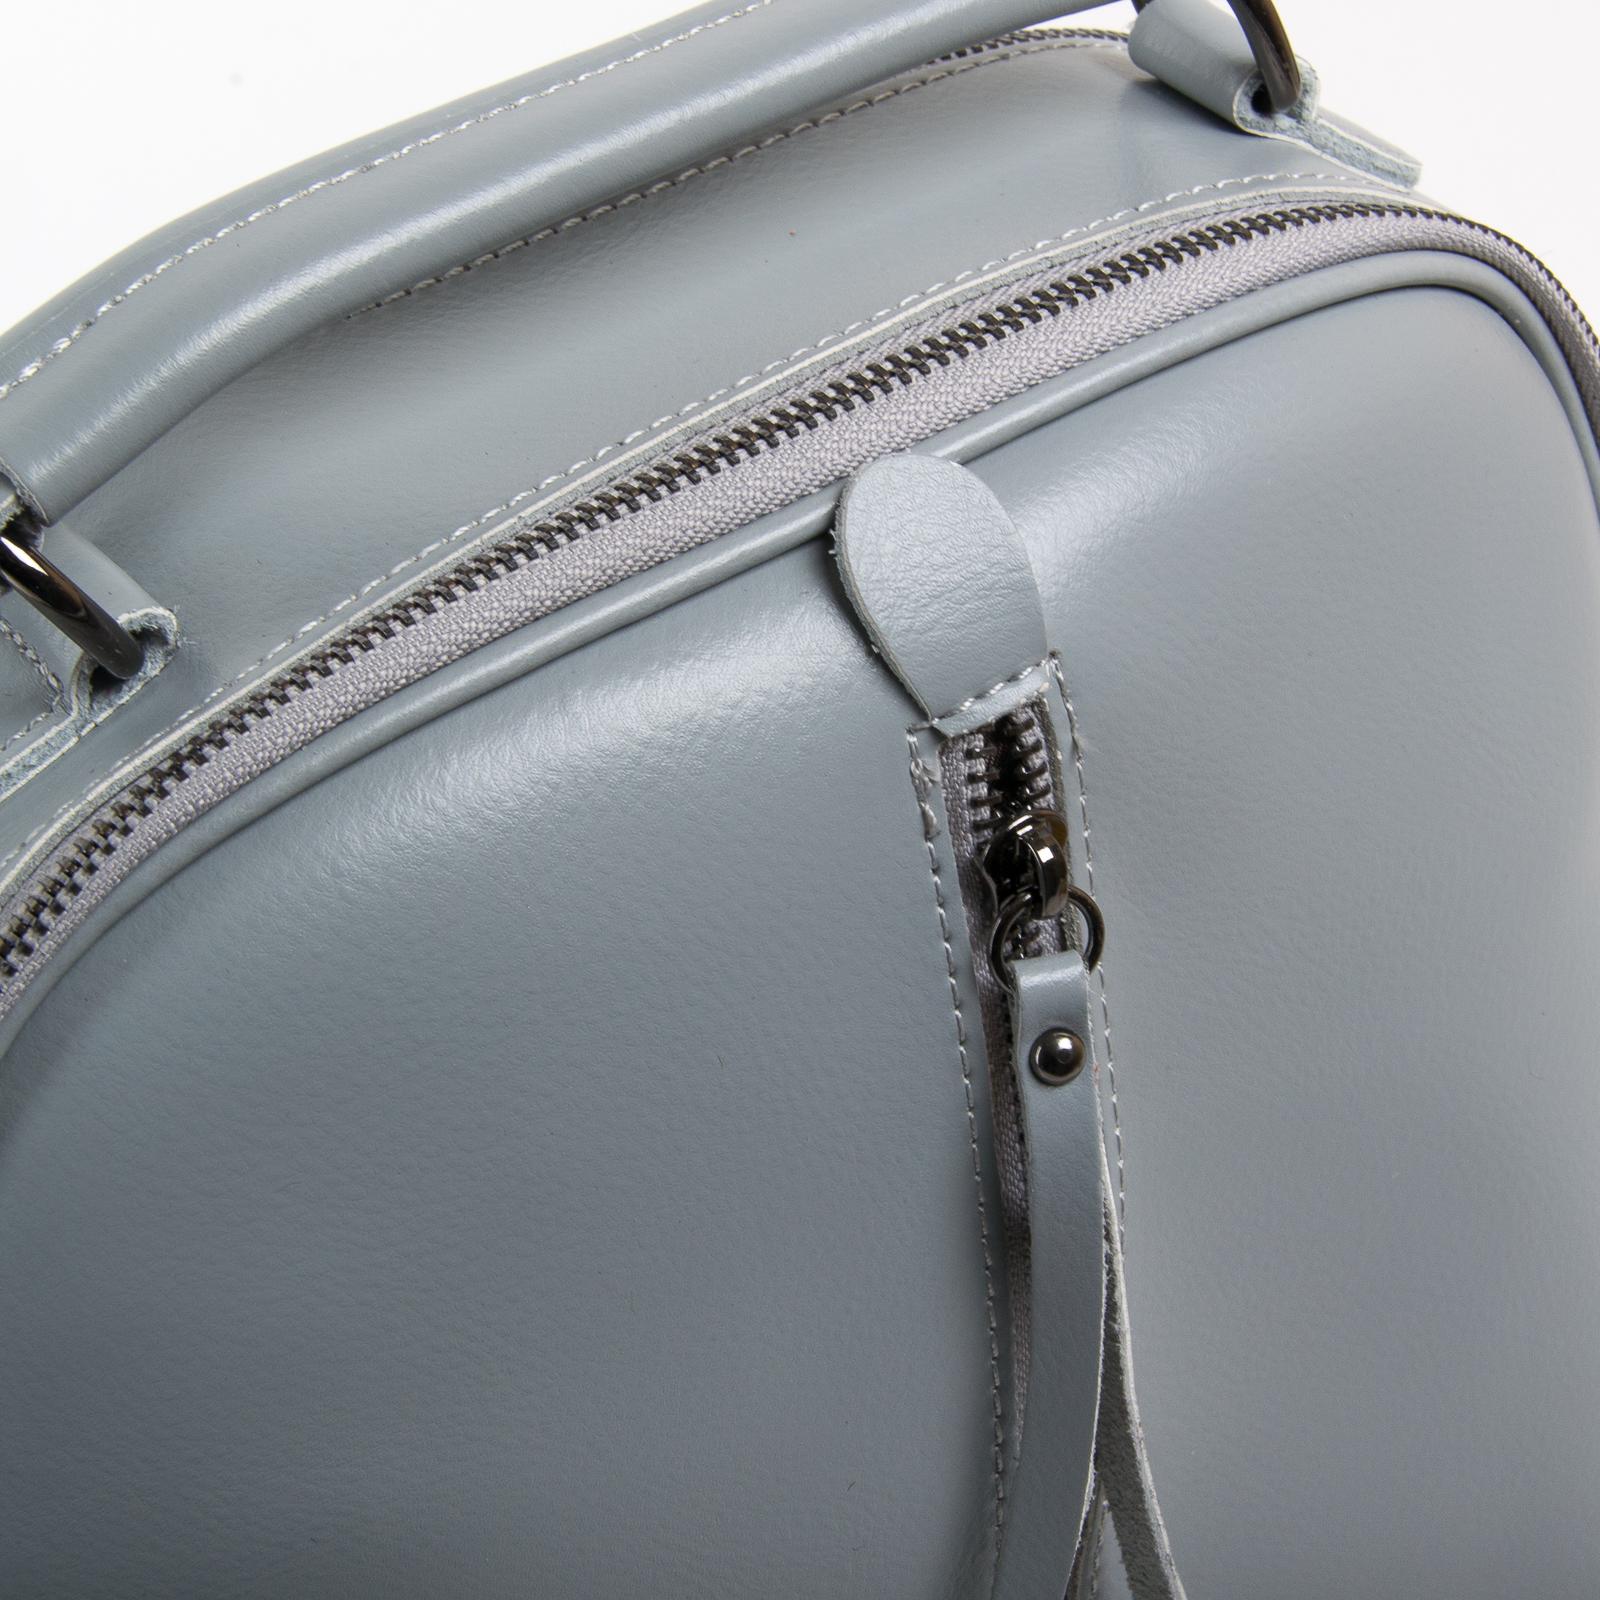 Сумка Женская Рюкзак кожа ALEX RAI 8694-3 l-grey - фото 3